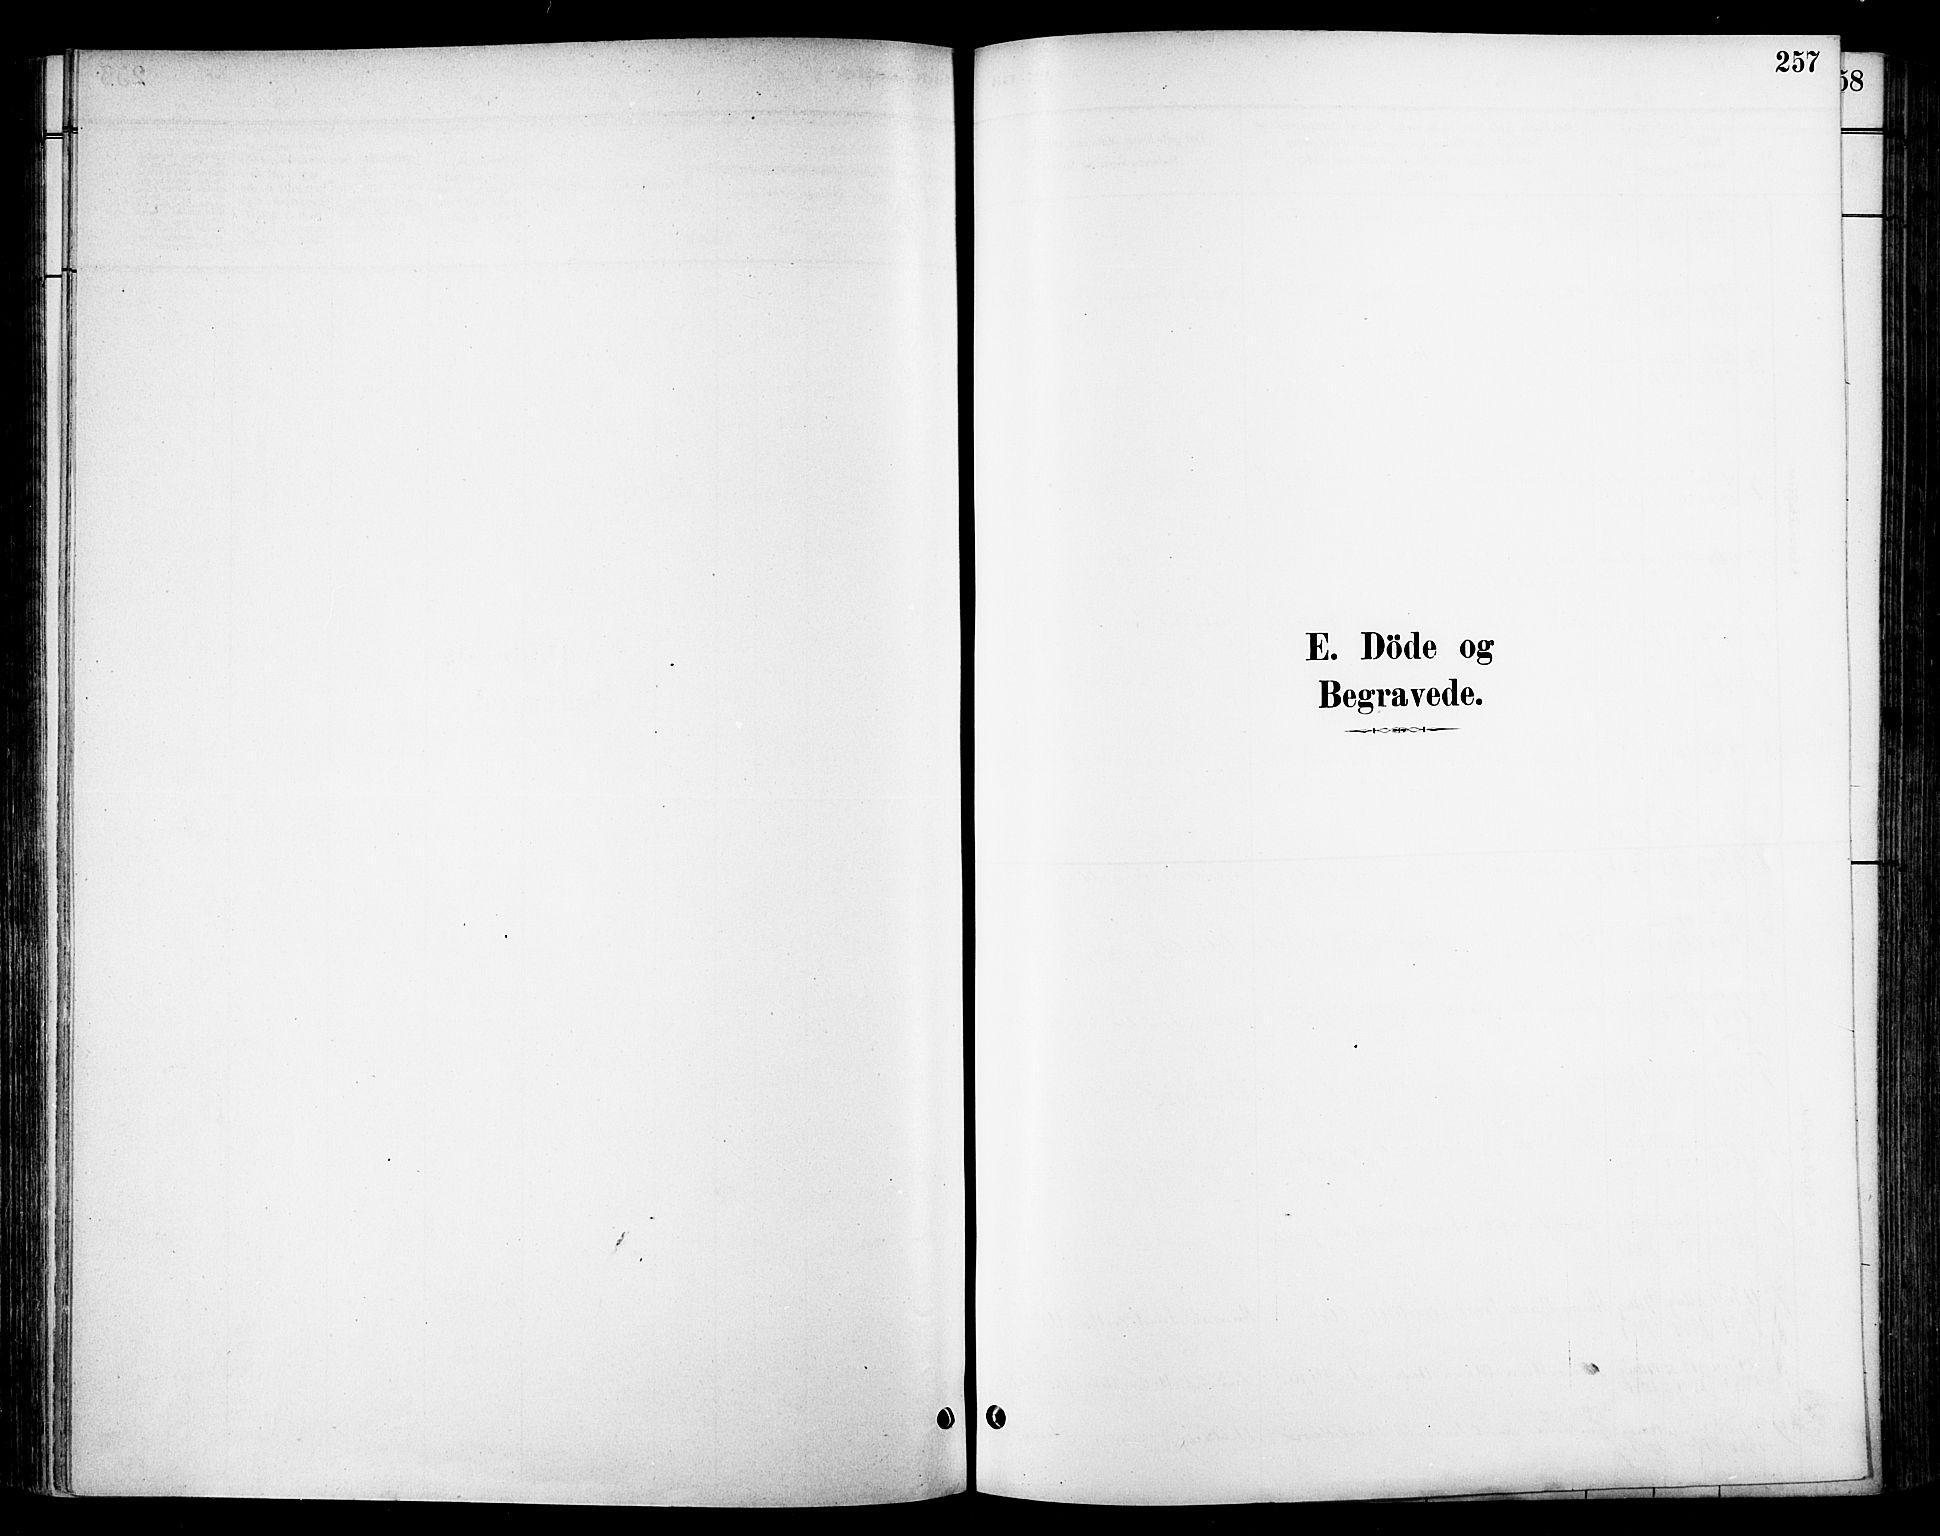 SAT, Ministerialprotokoller, klokkerbøker og fødselsregistre - Sør-Trøndelag, 678/L0901: Parish register (official) no. 678A10, 1881-1894, p. 257